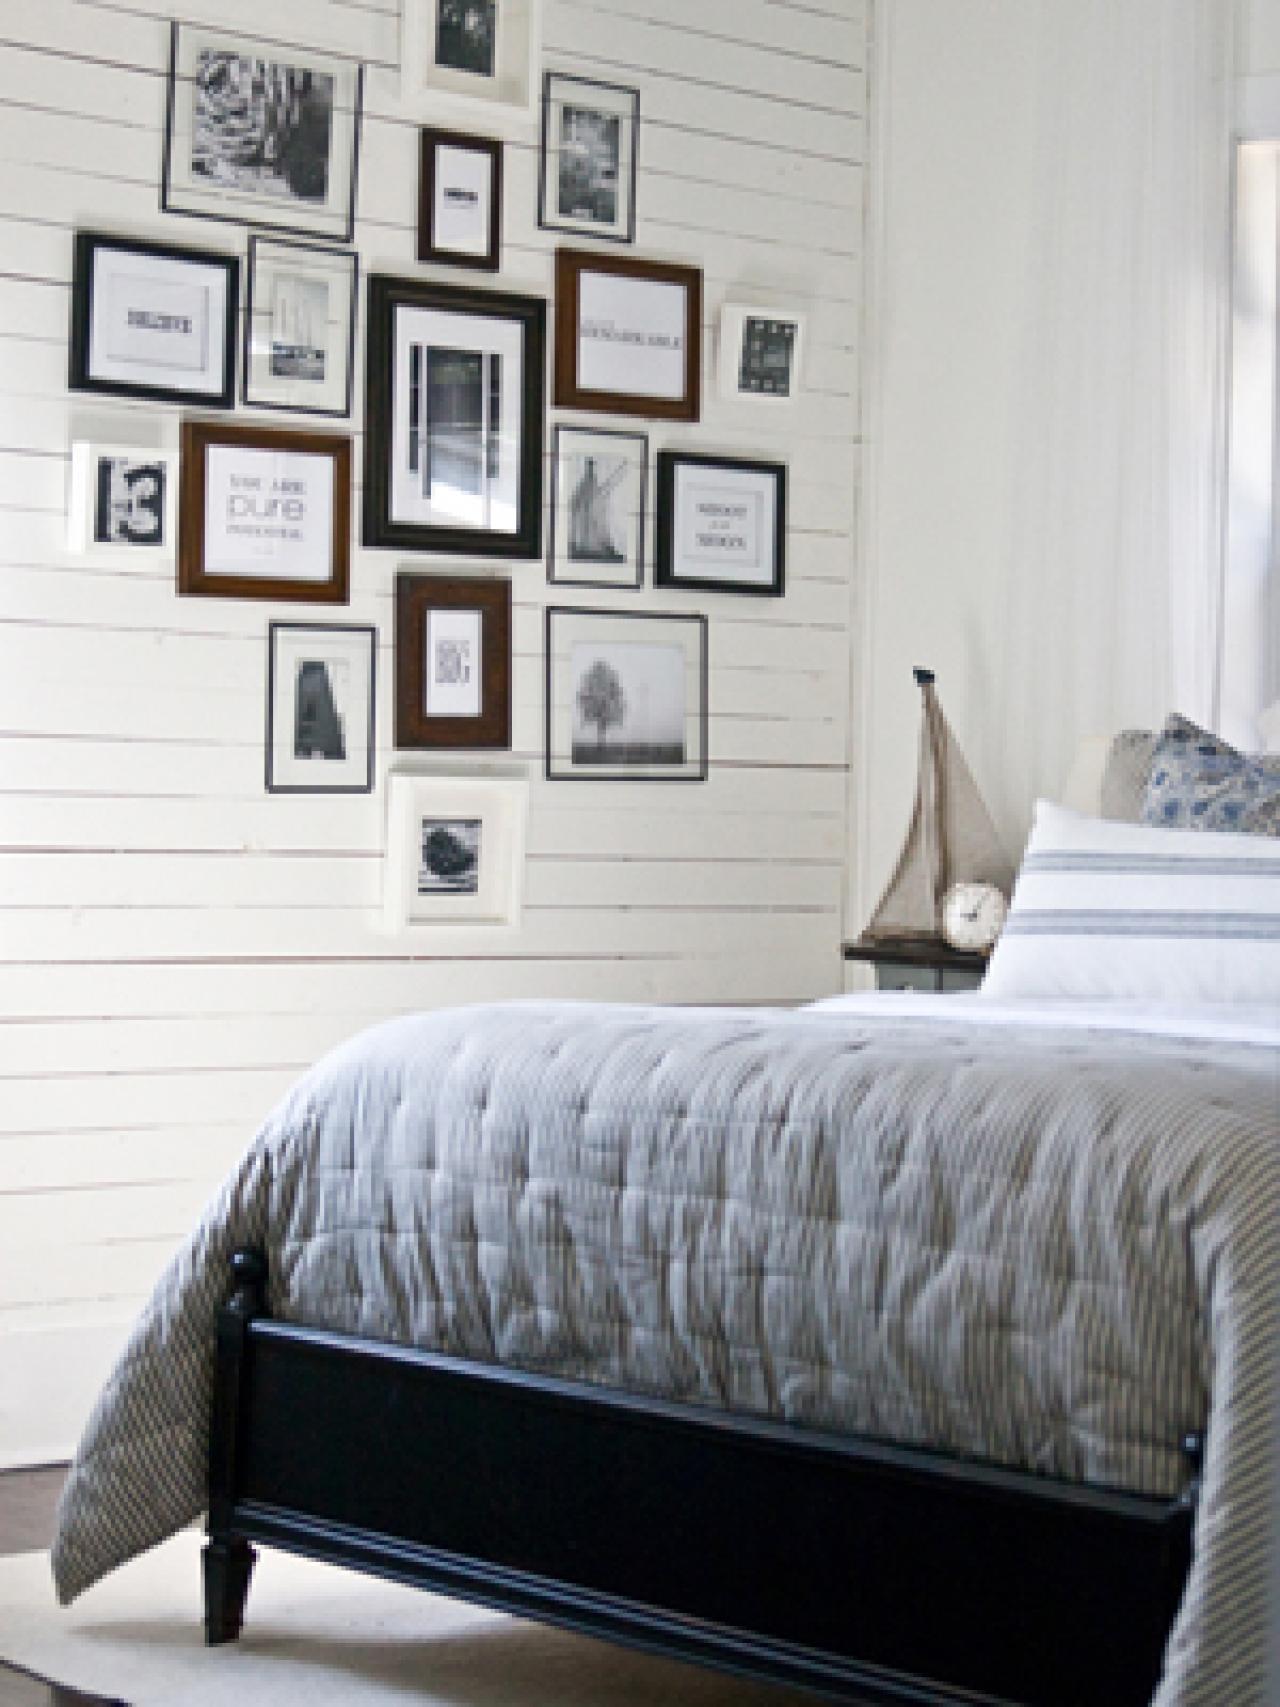 Bedroom : Over Bed Lighting Led Wall Lights Indoor Sconce Lights Inside Wall Art Over Bed (Image 7 of 20)